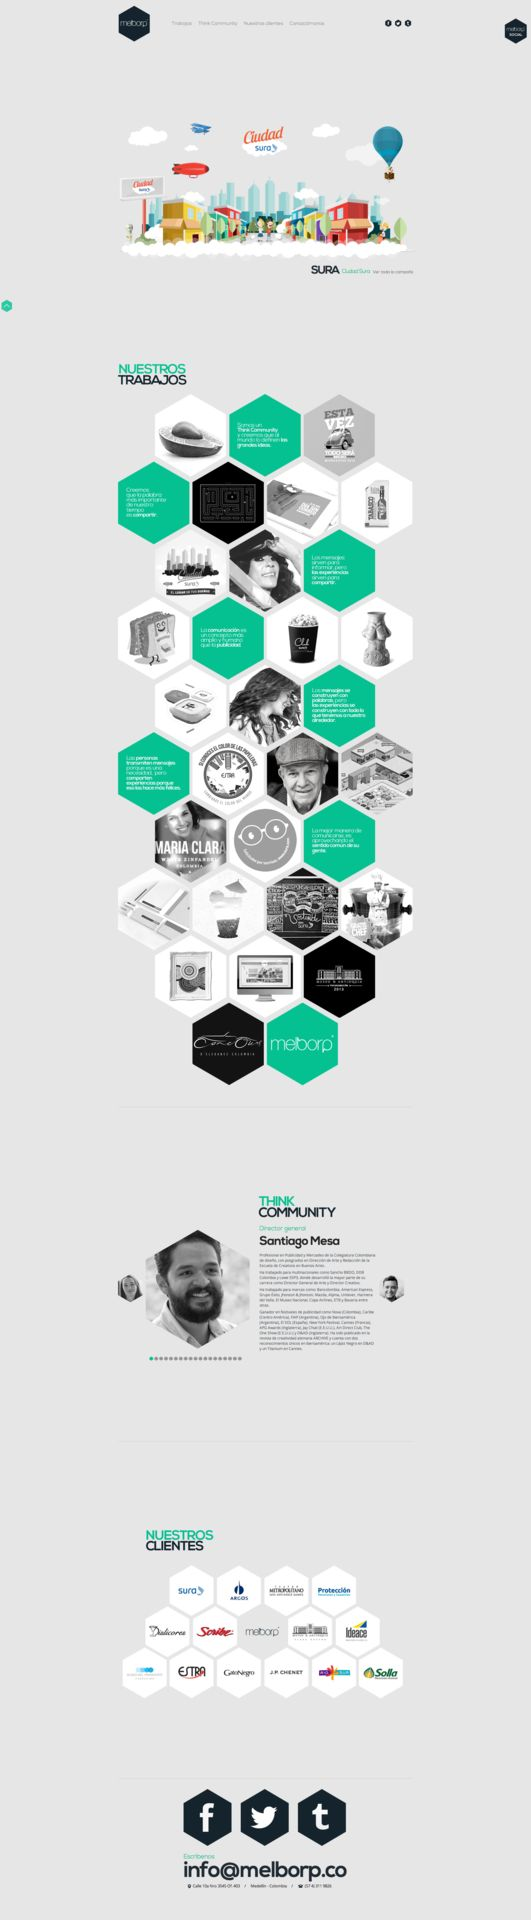 Unique Web Design, Melborp @rivkyguan #WebDesign #Design (http://www.pinterest.com/aldenchong/)